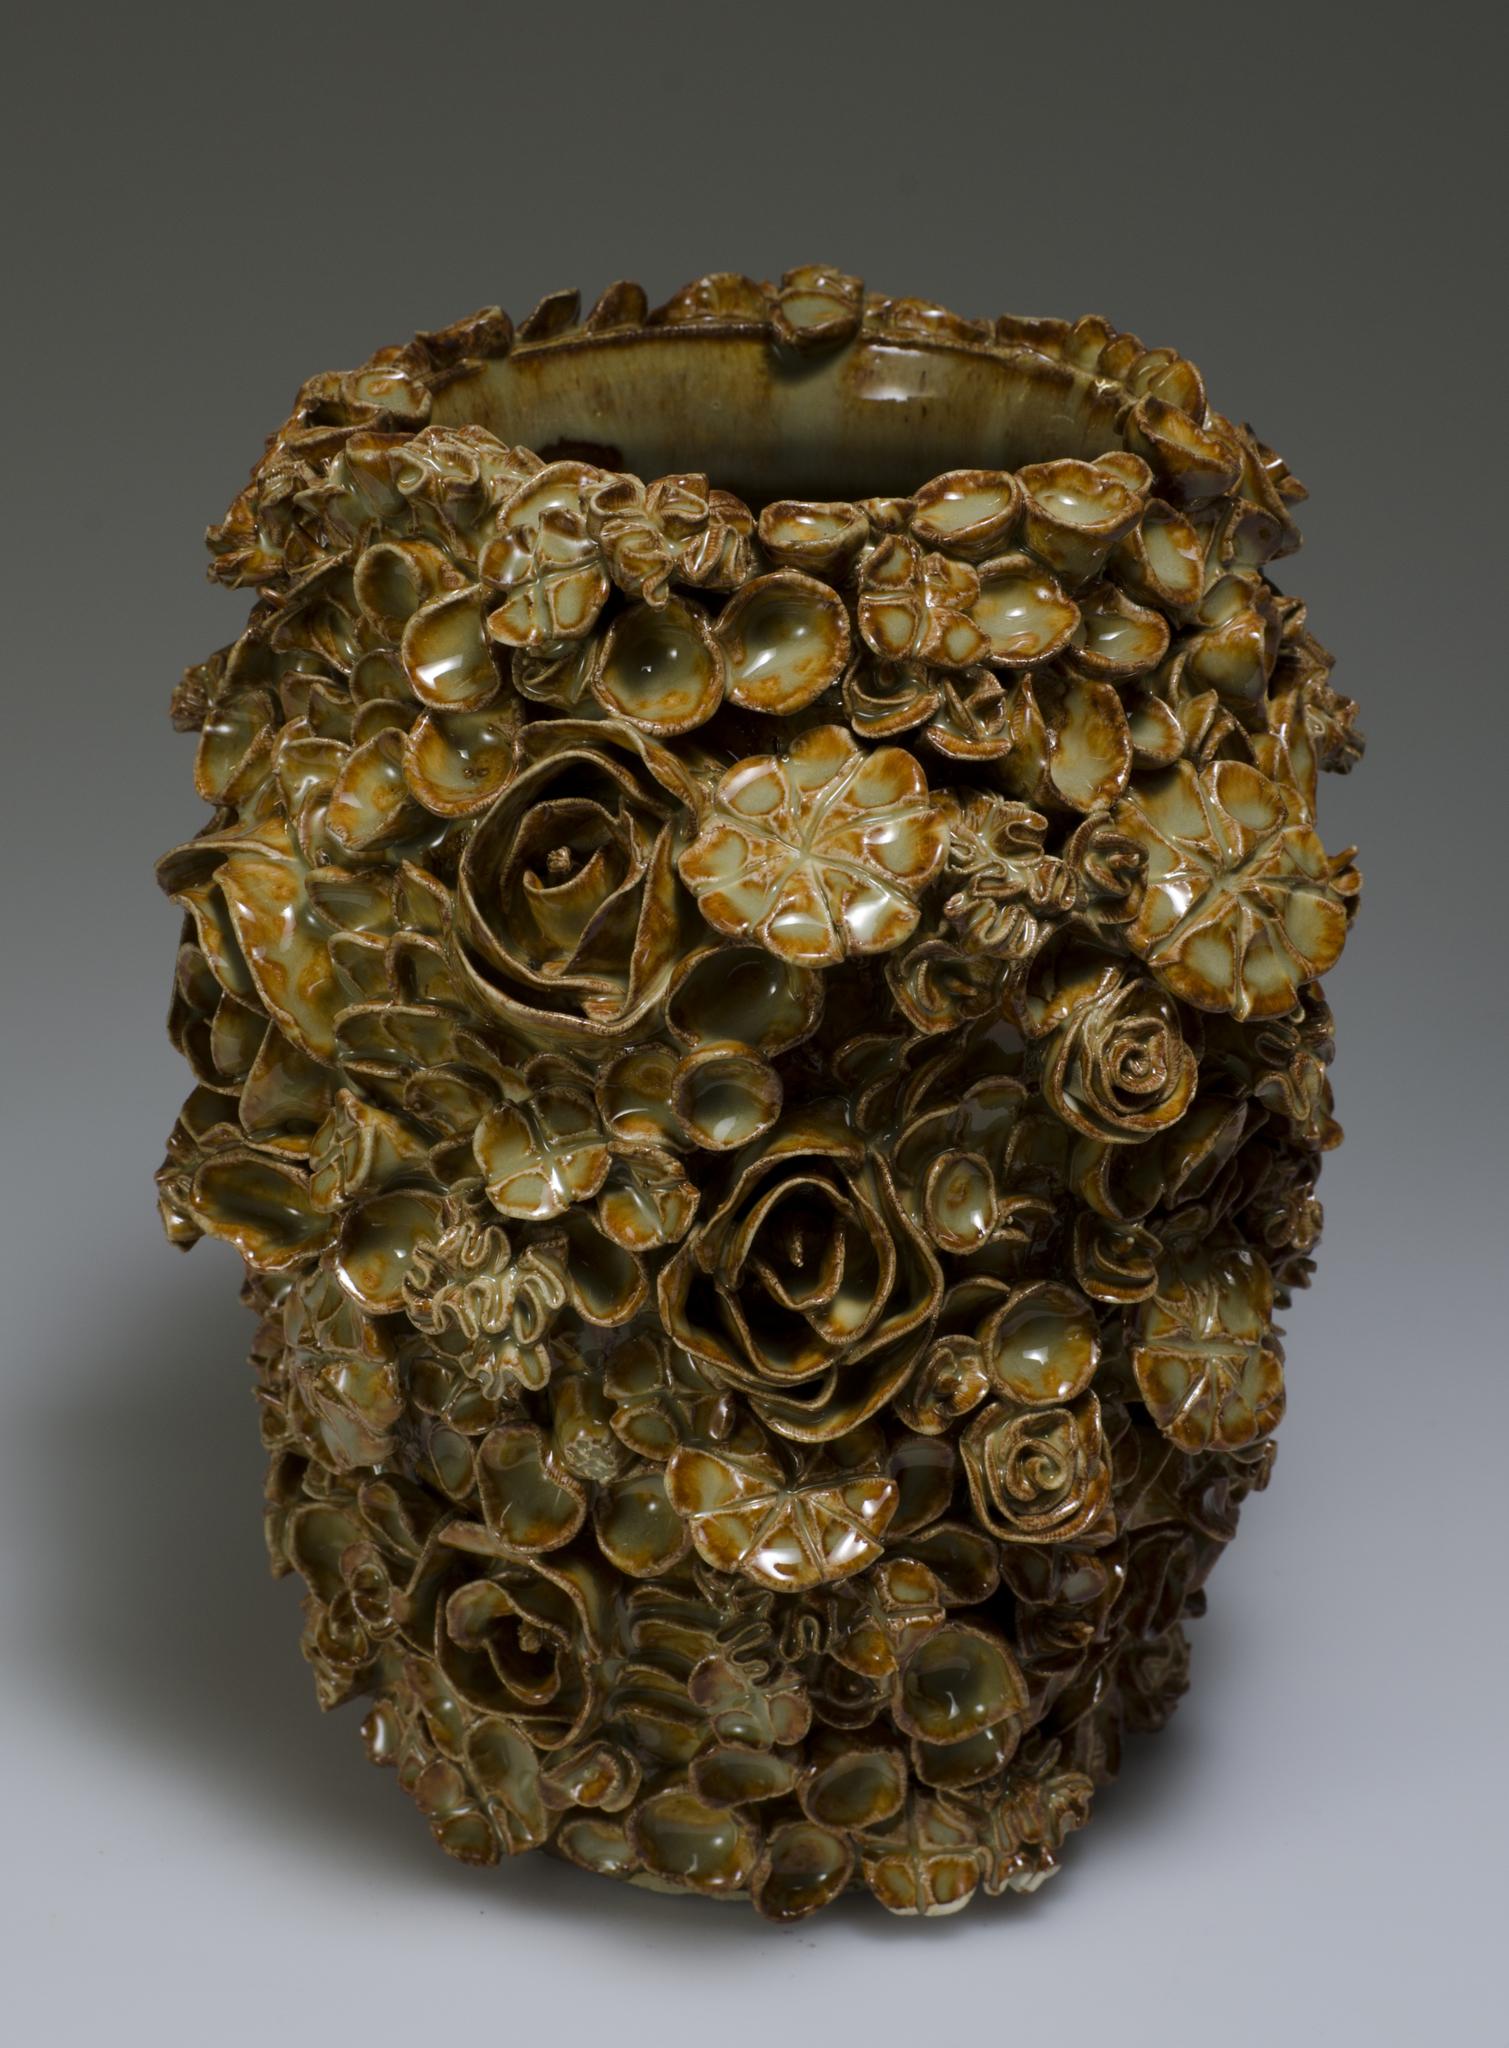 Old Habits Vase